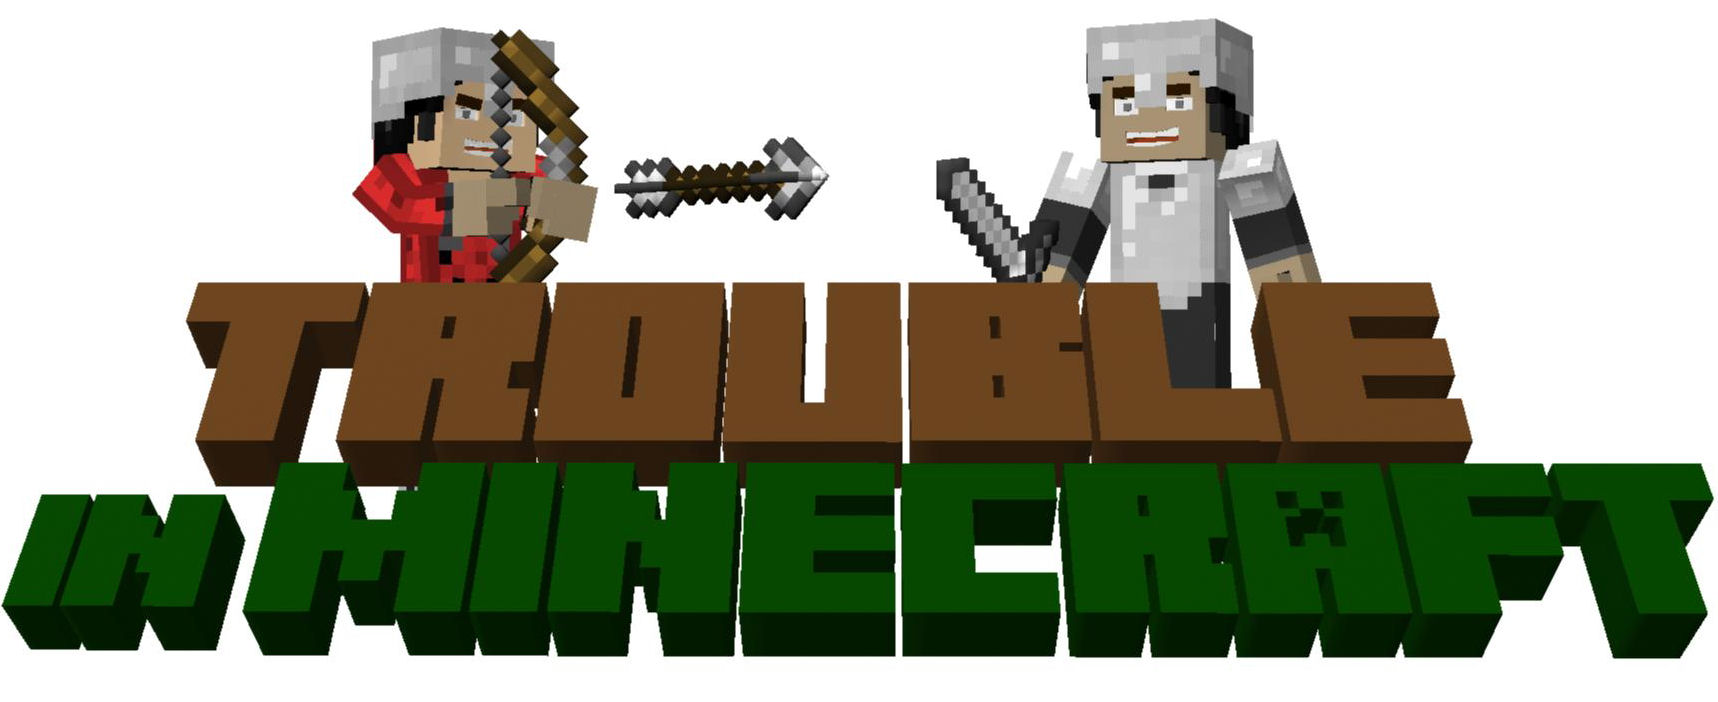 Overview Trouble In Minecraft Bukkit Plugins Projects Bukkit - Minecraft spielerkopfe geben